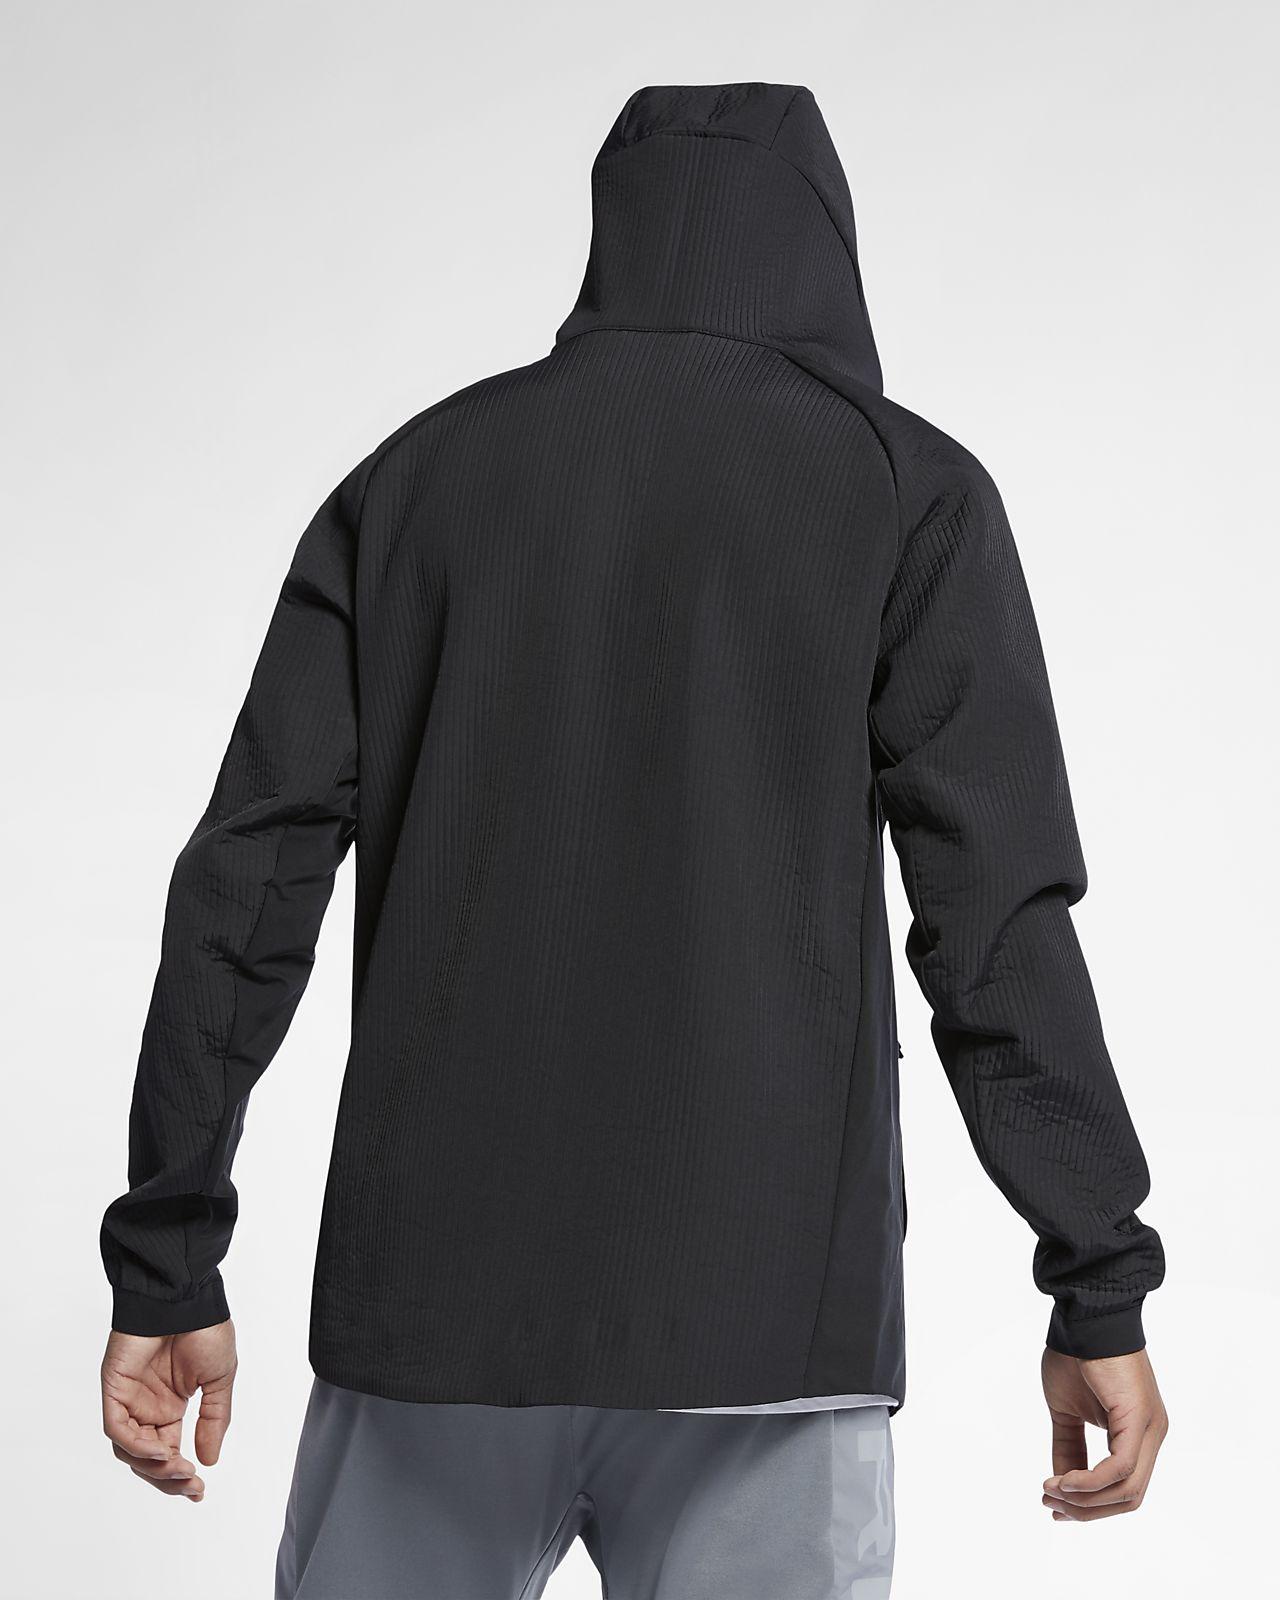 430e1201fe Nike Sportswear Tech Pack szőtt férfikabát. Nike.com HU